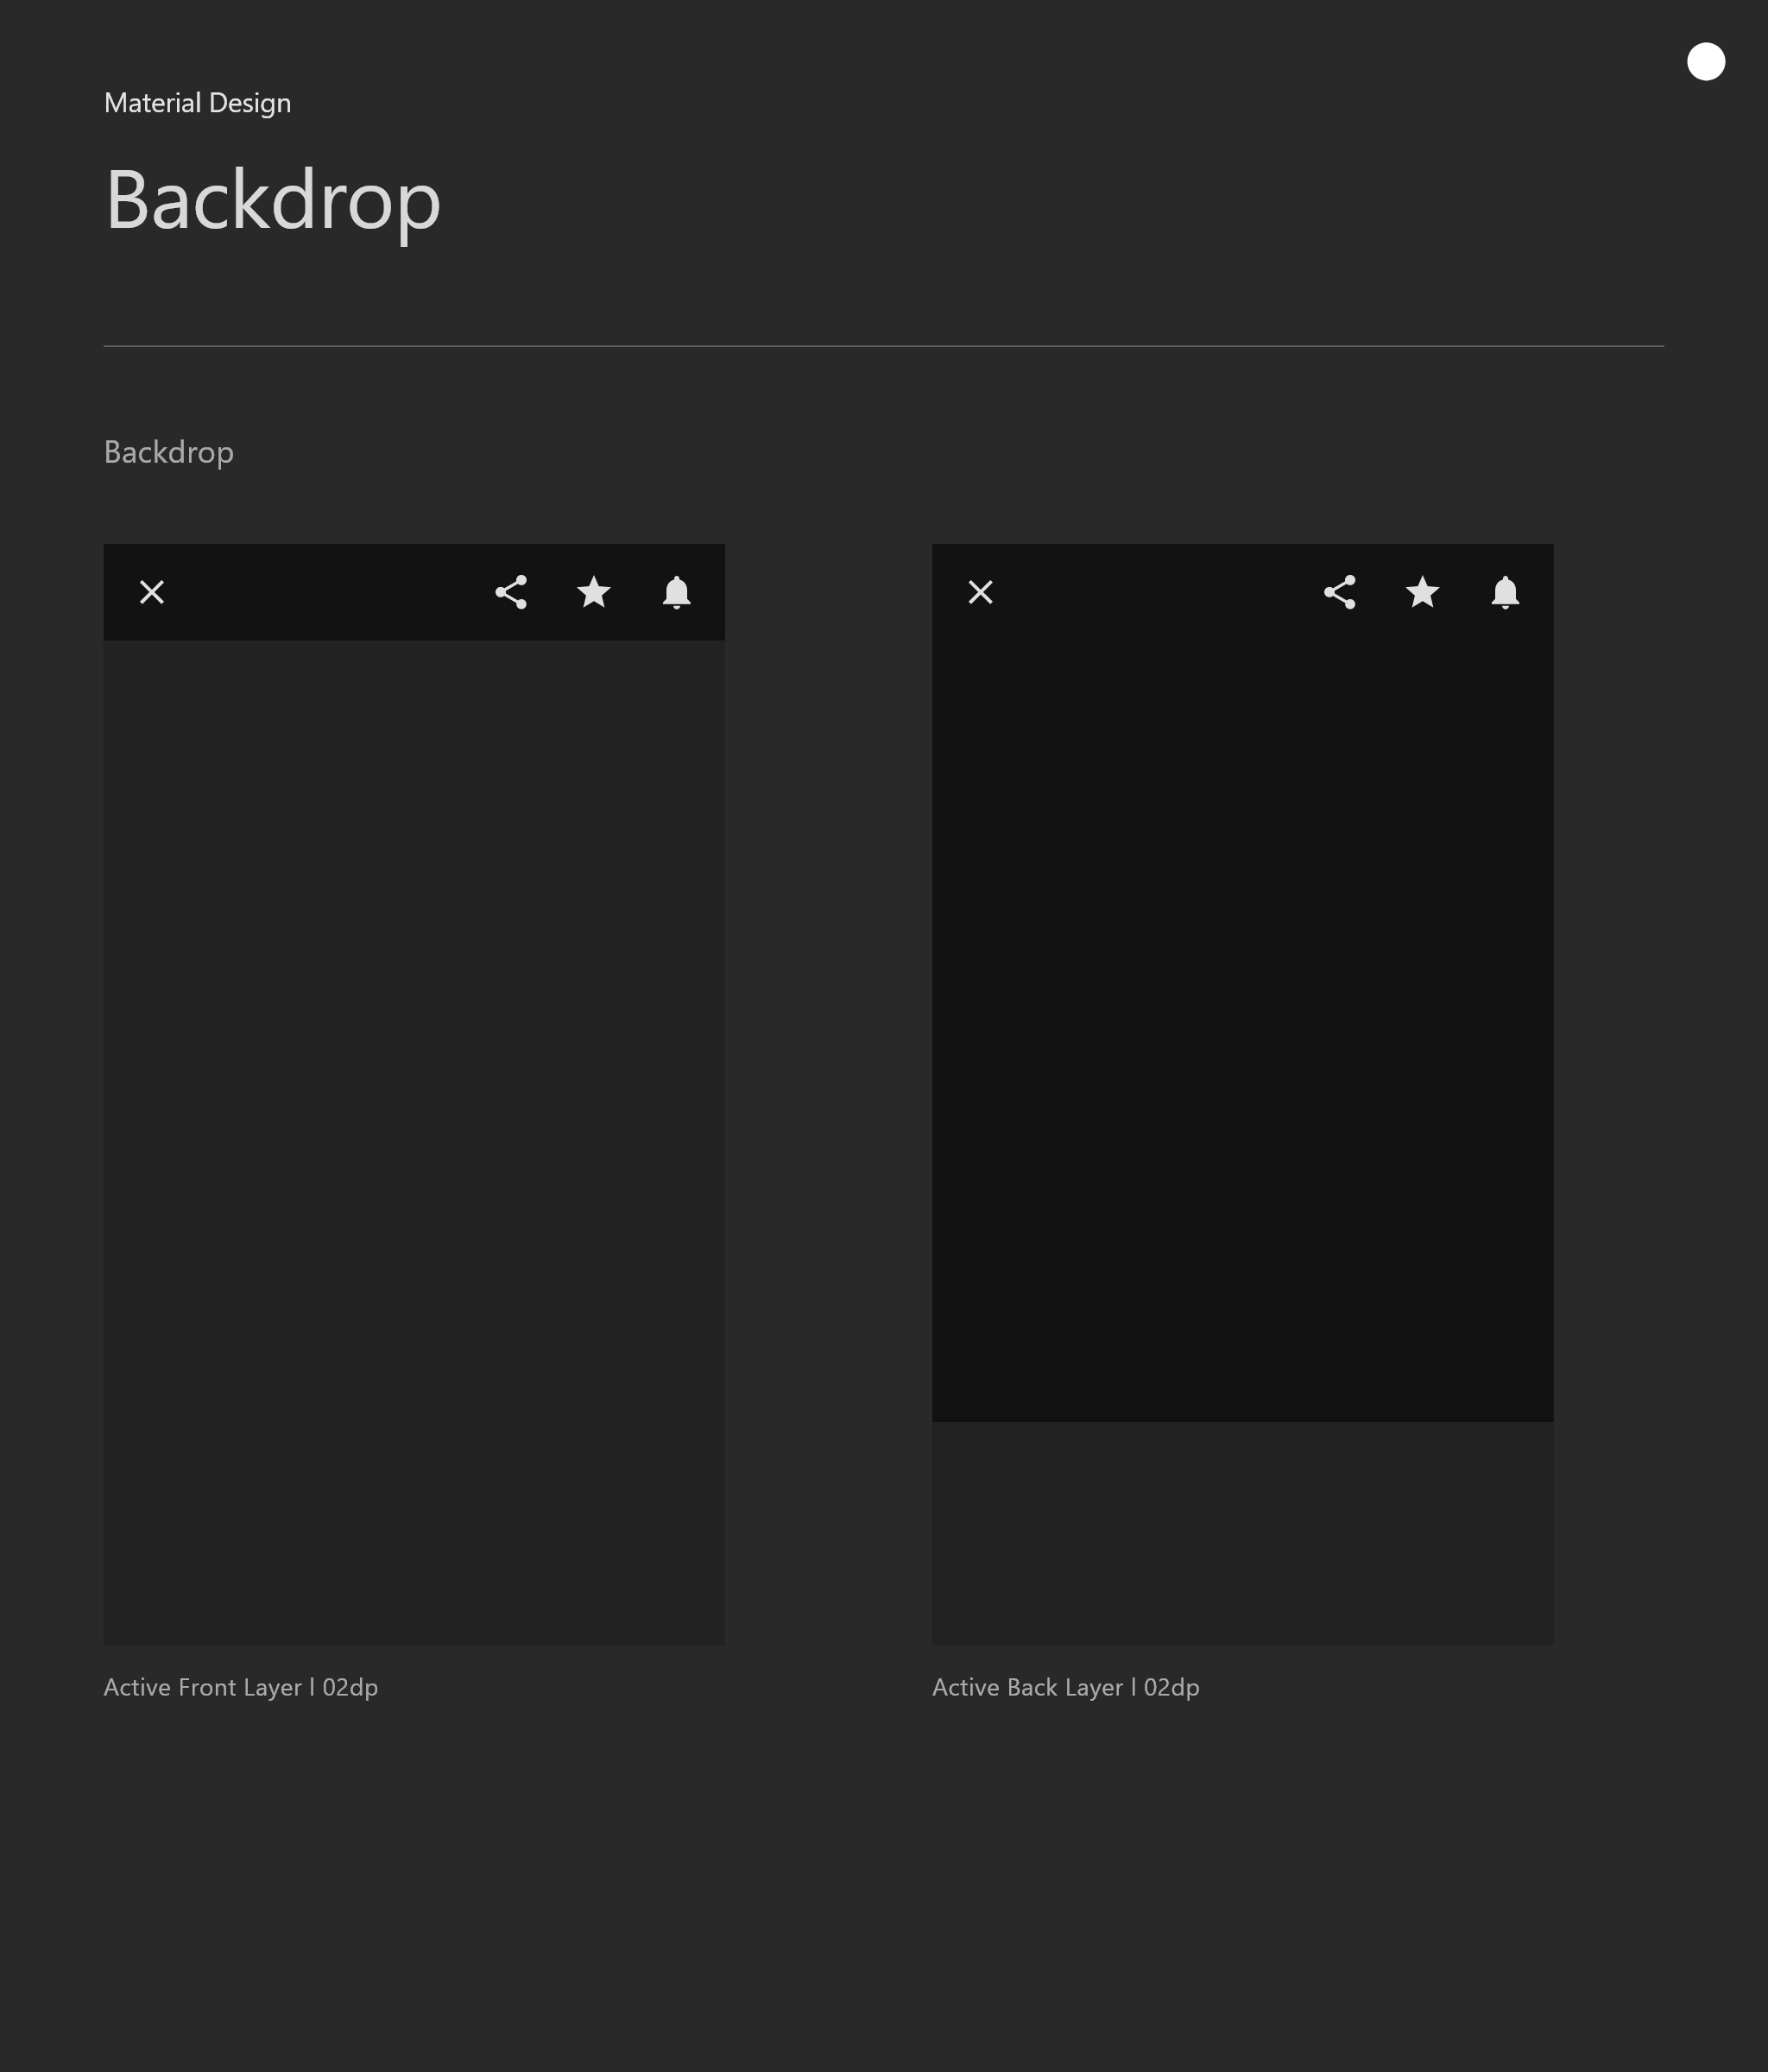 谷歌安卓 Android深色主题设计规范google ui深色模式